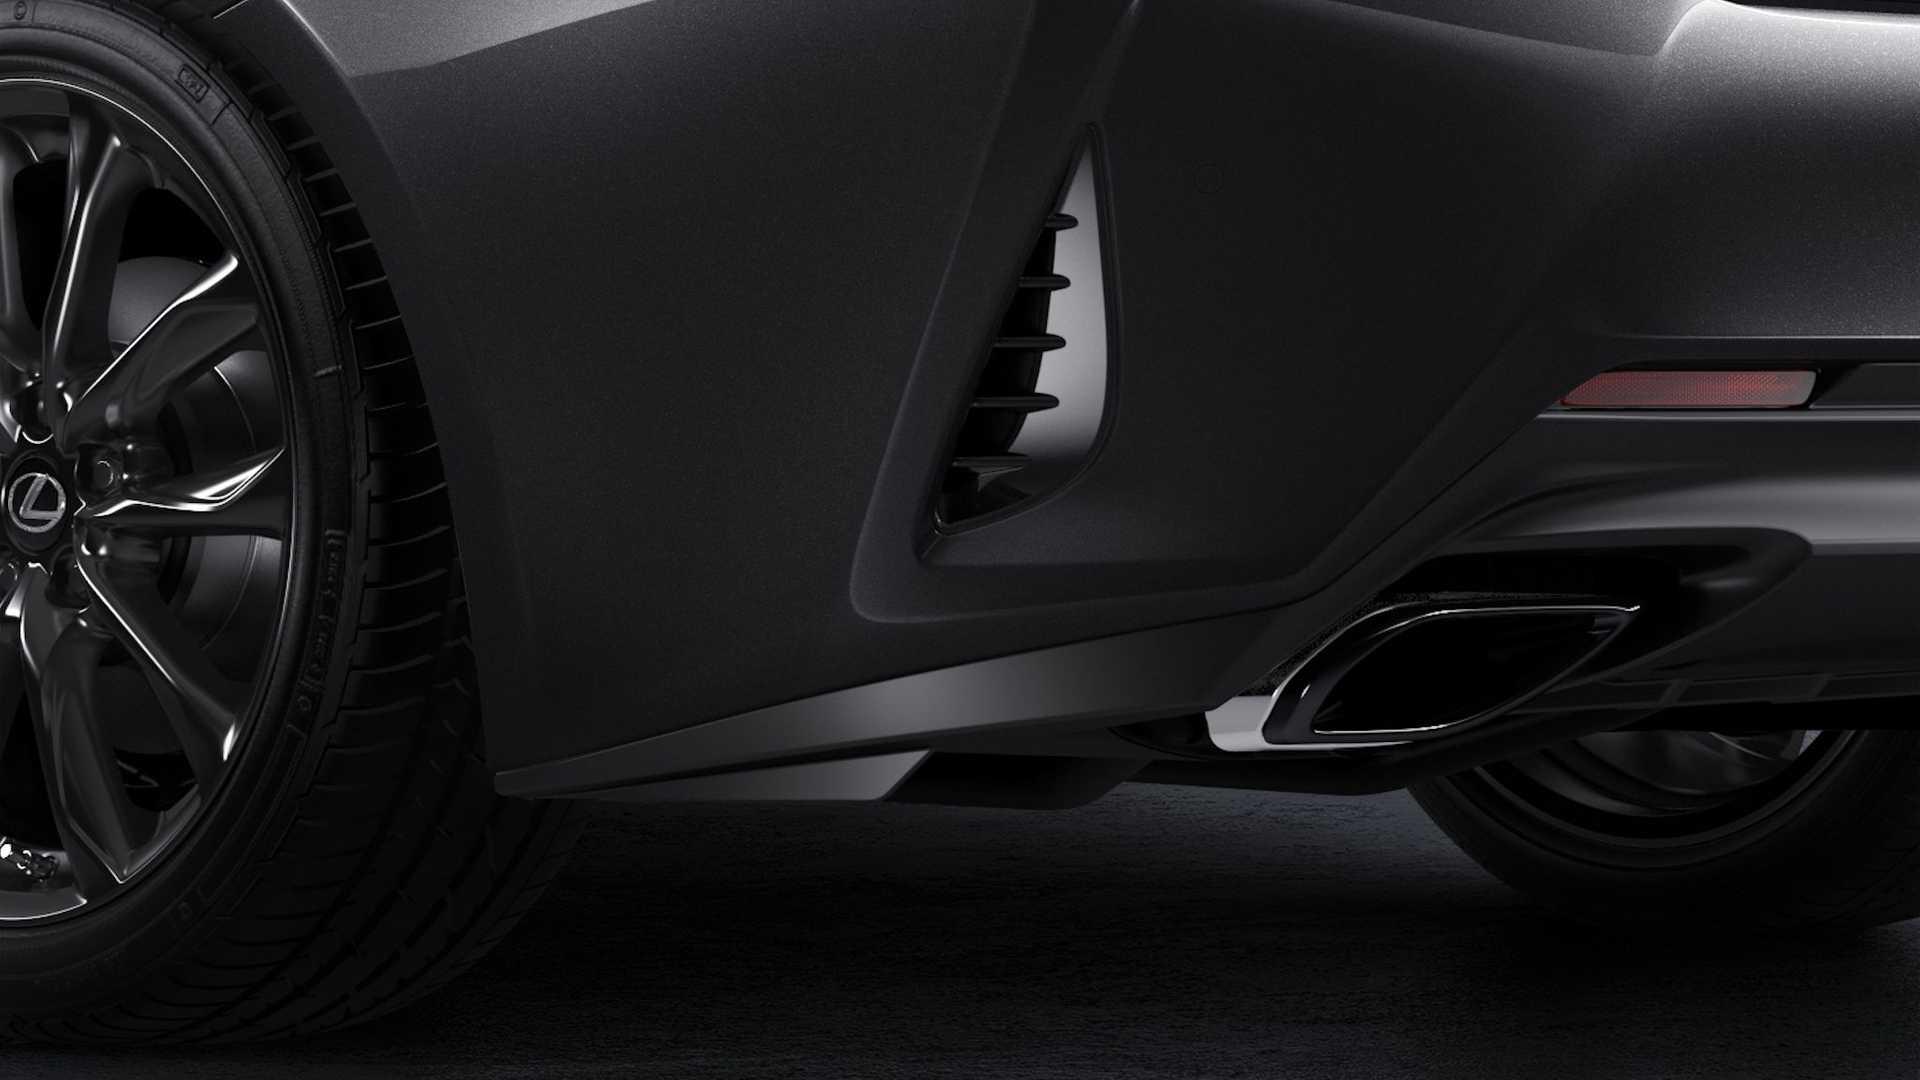 2021-lexus-rc-black-line-5